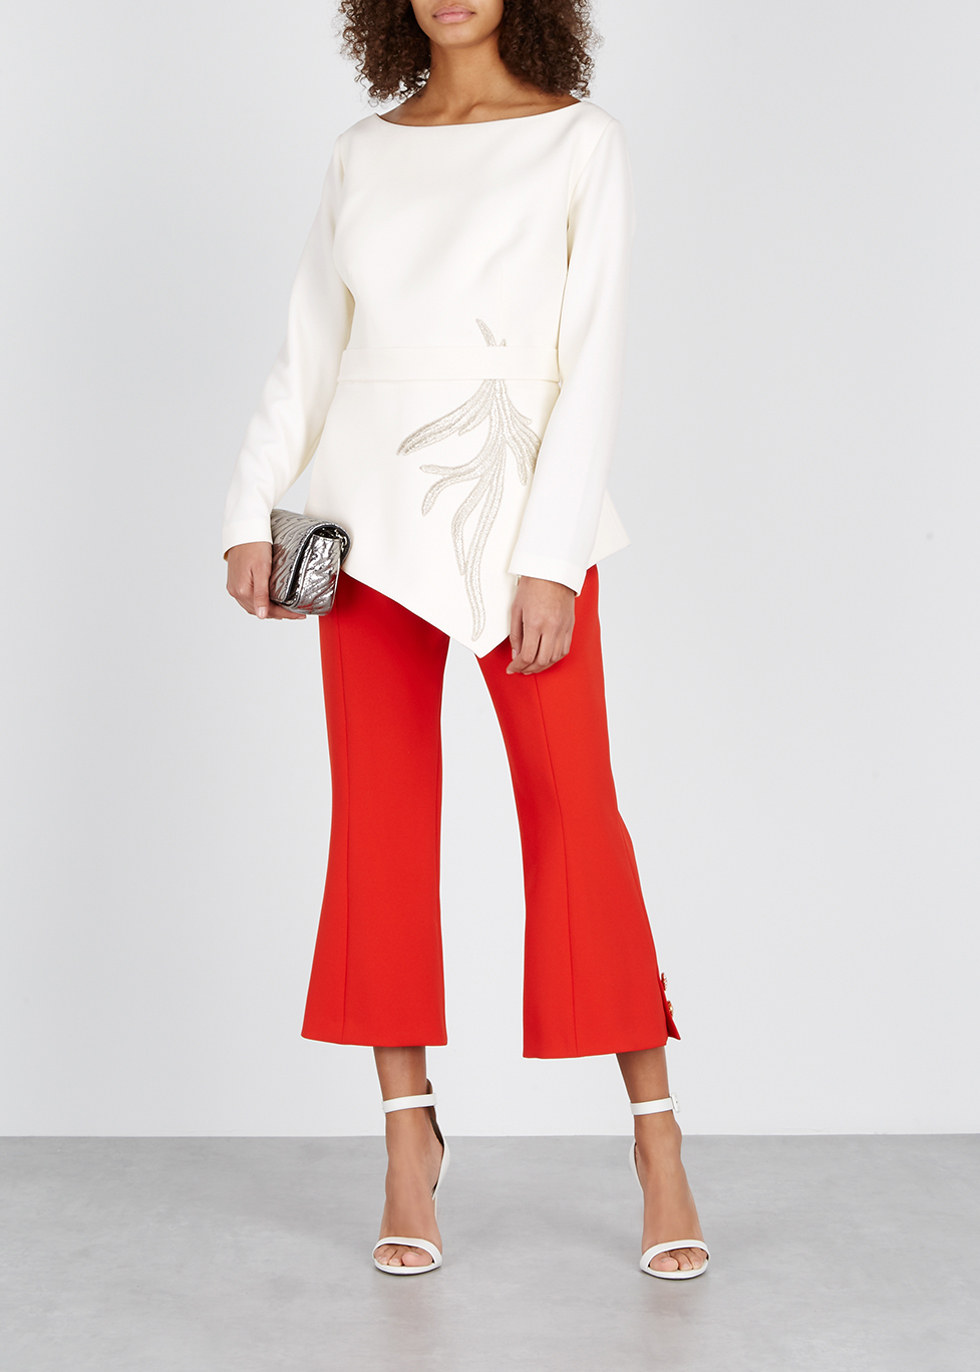 8a322ac028bb1 Women s Designer Tops - Lace   Silk - Harvey Nichols